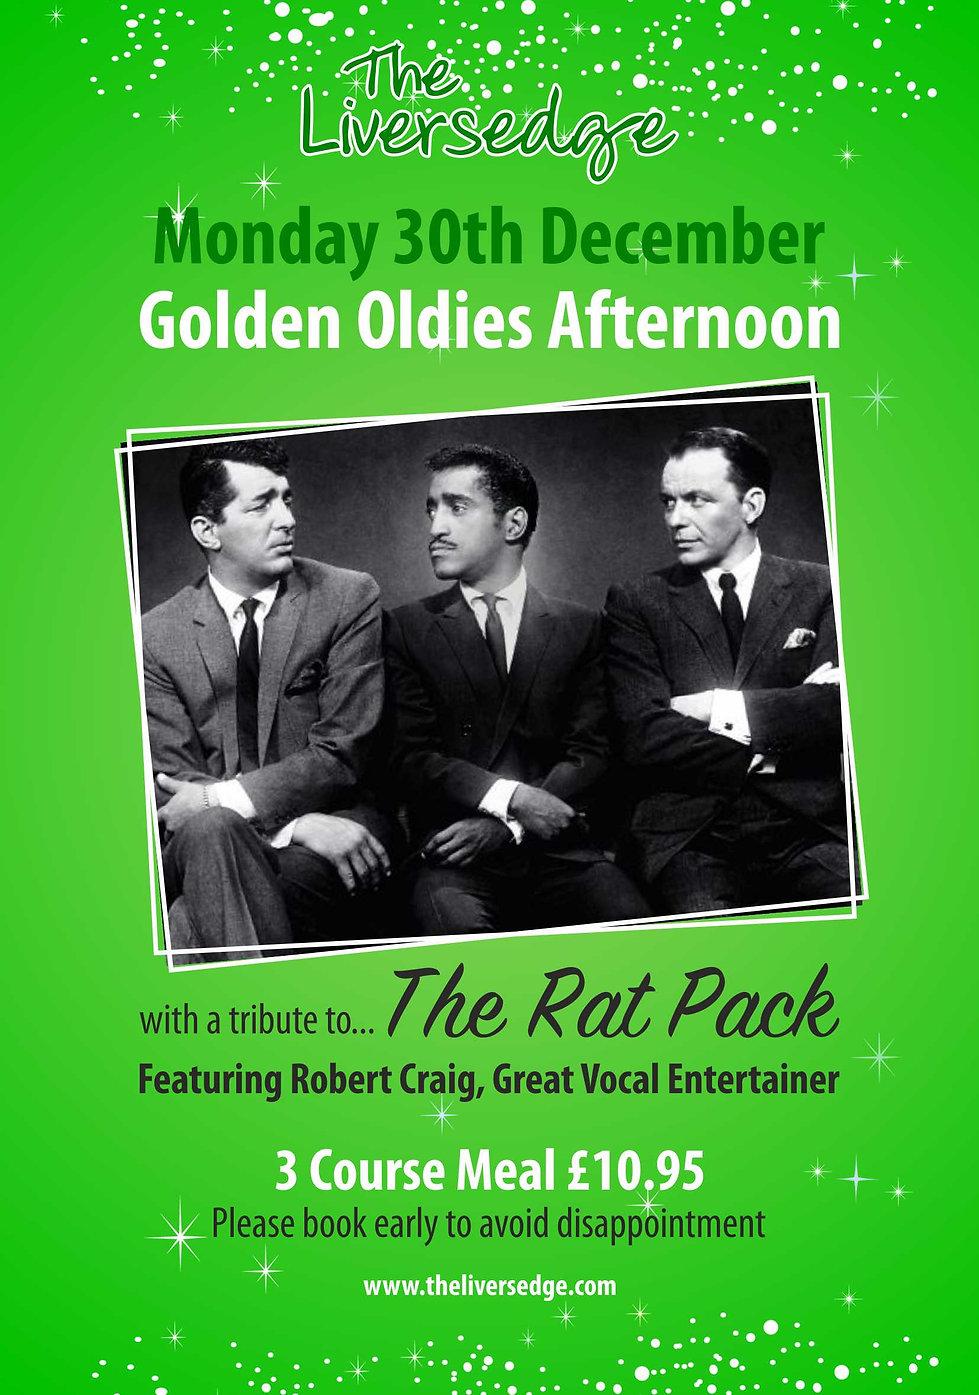 Liversedge Golden oldies poster.jpg